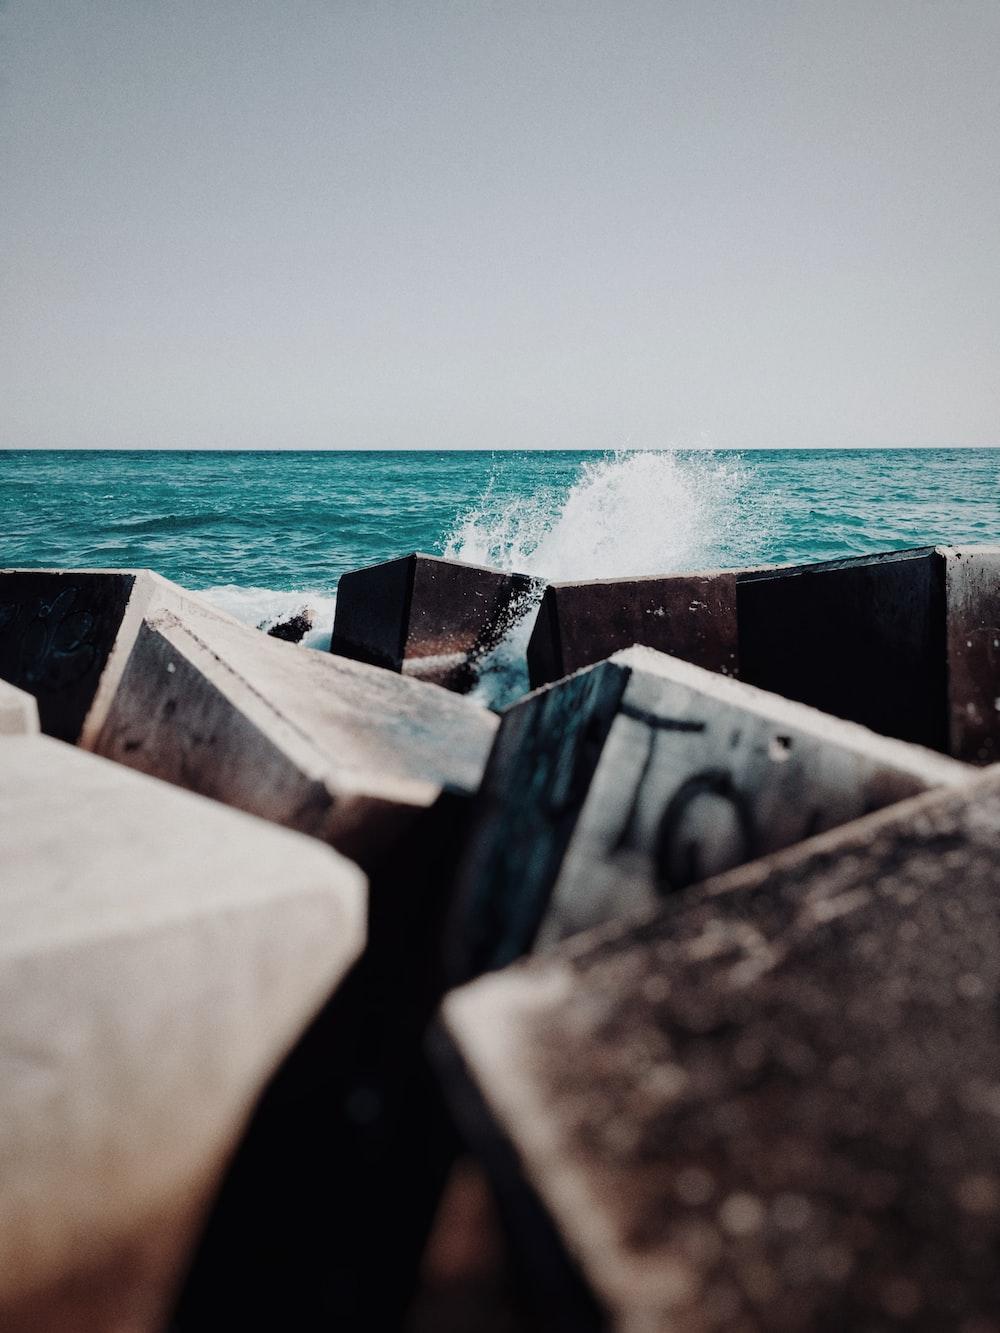 rocks near seashore view